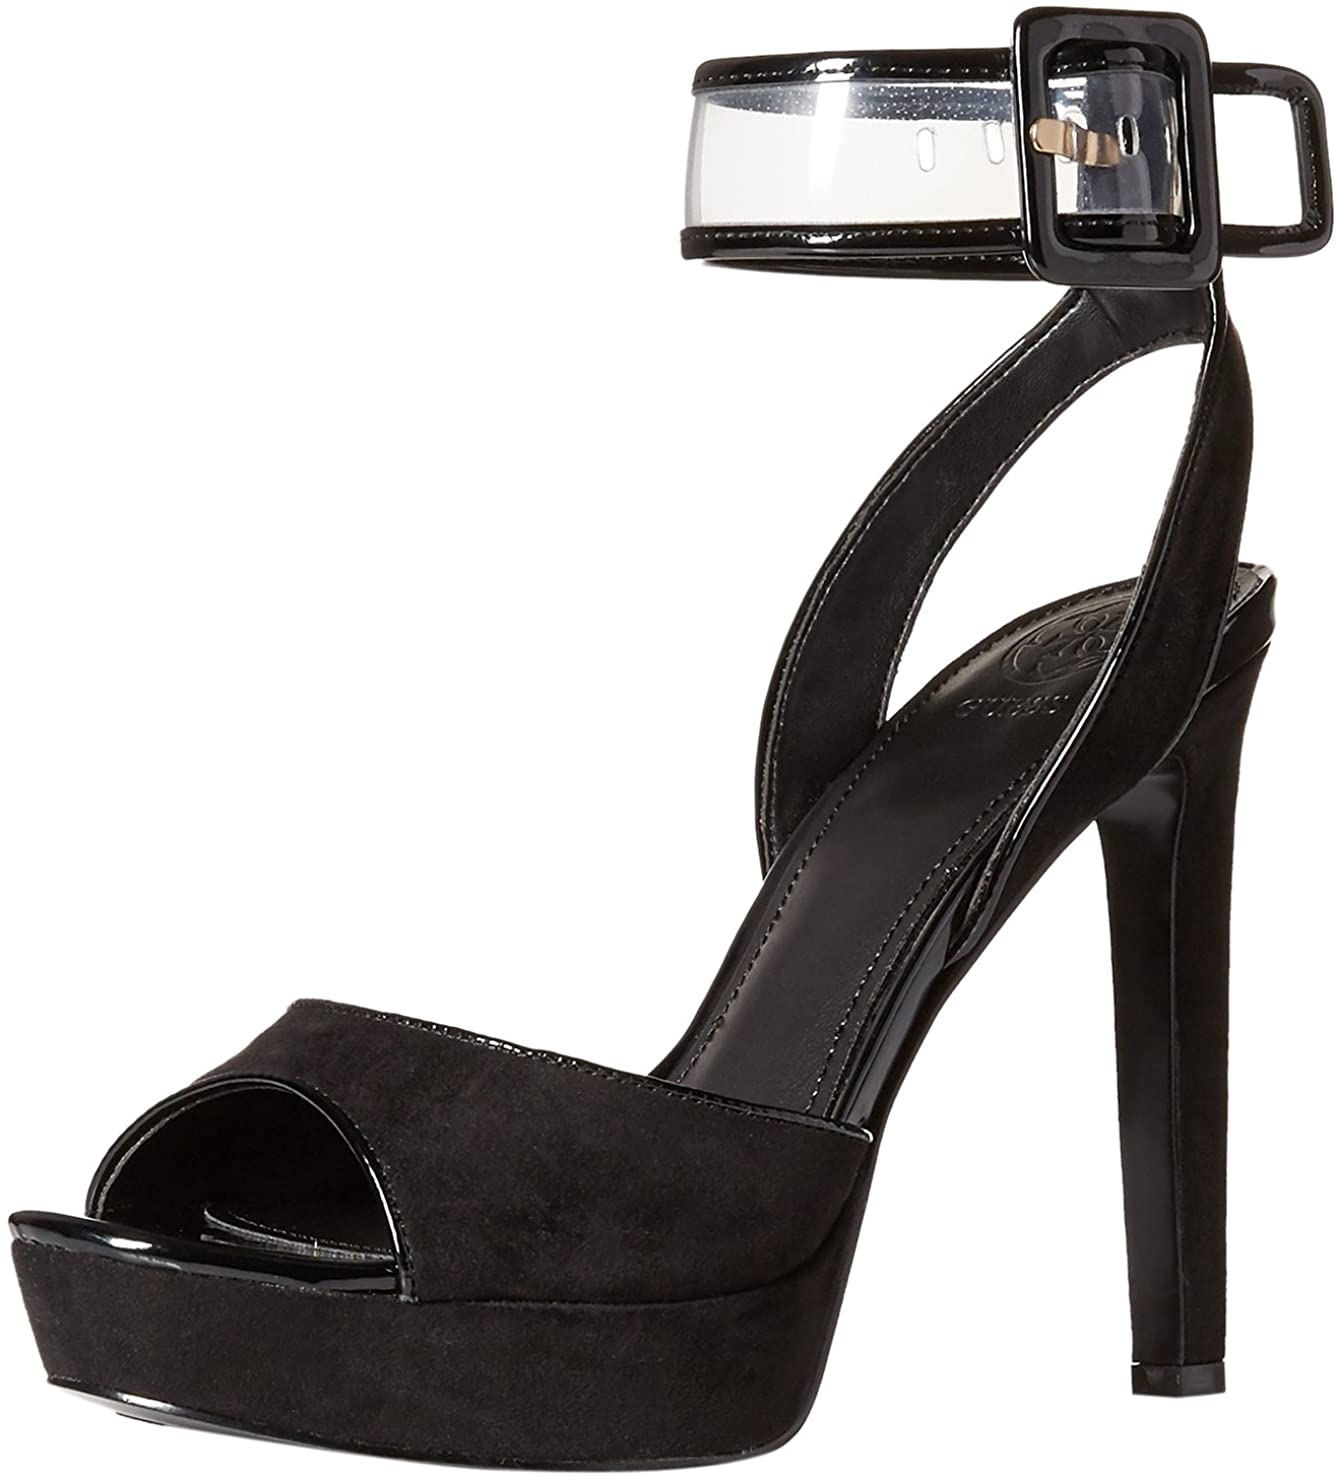 GUESS Women's CATANA Heeled Sandal